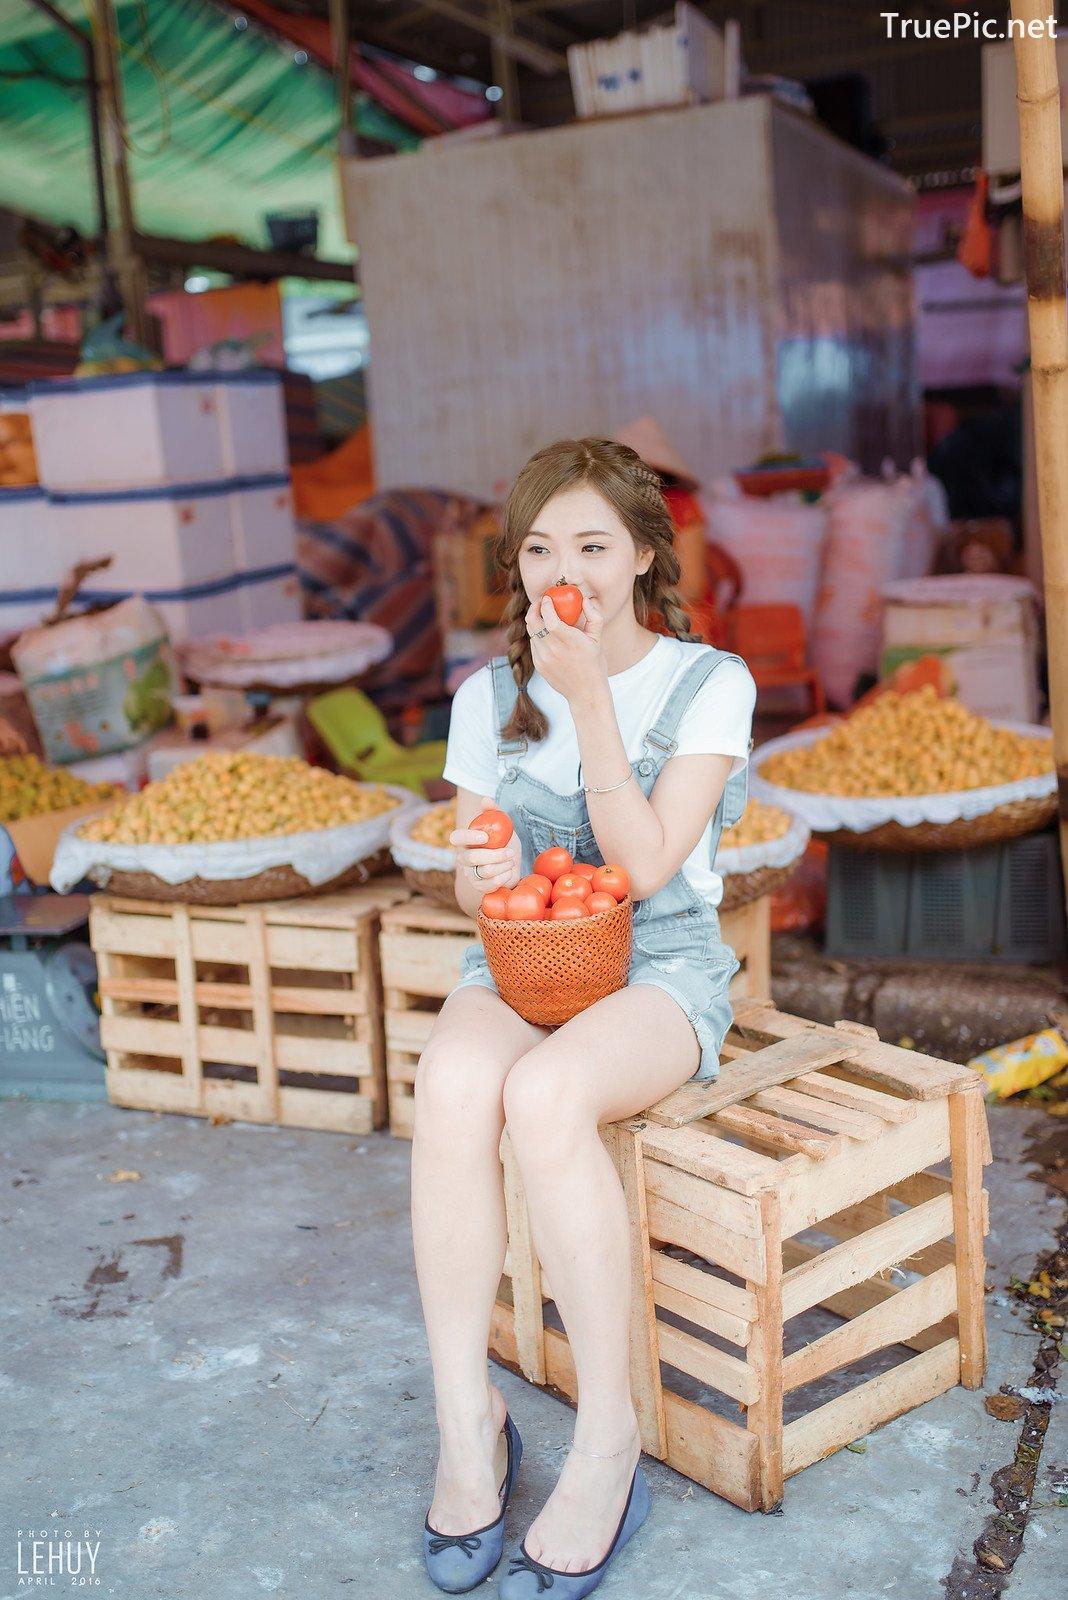 Image-Vietnamese-Hot-Girl-Photo-Album-Tomato-Little-Girl-Cute-TruePic.net- Picture-8